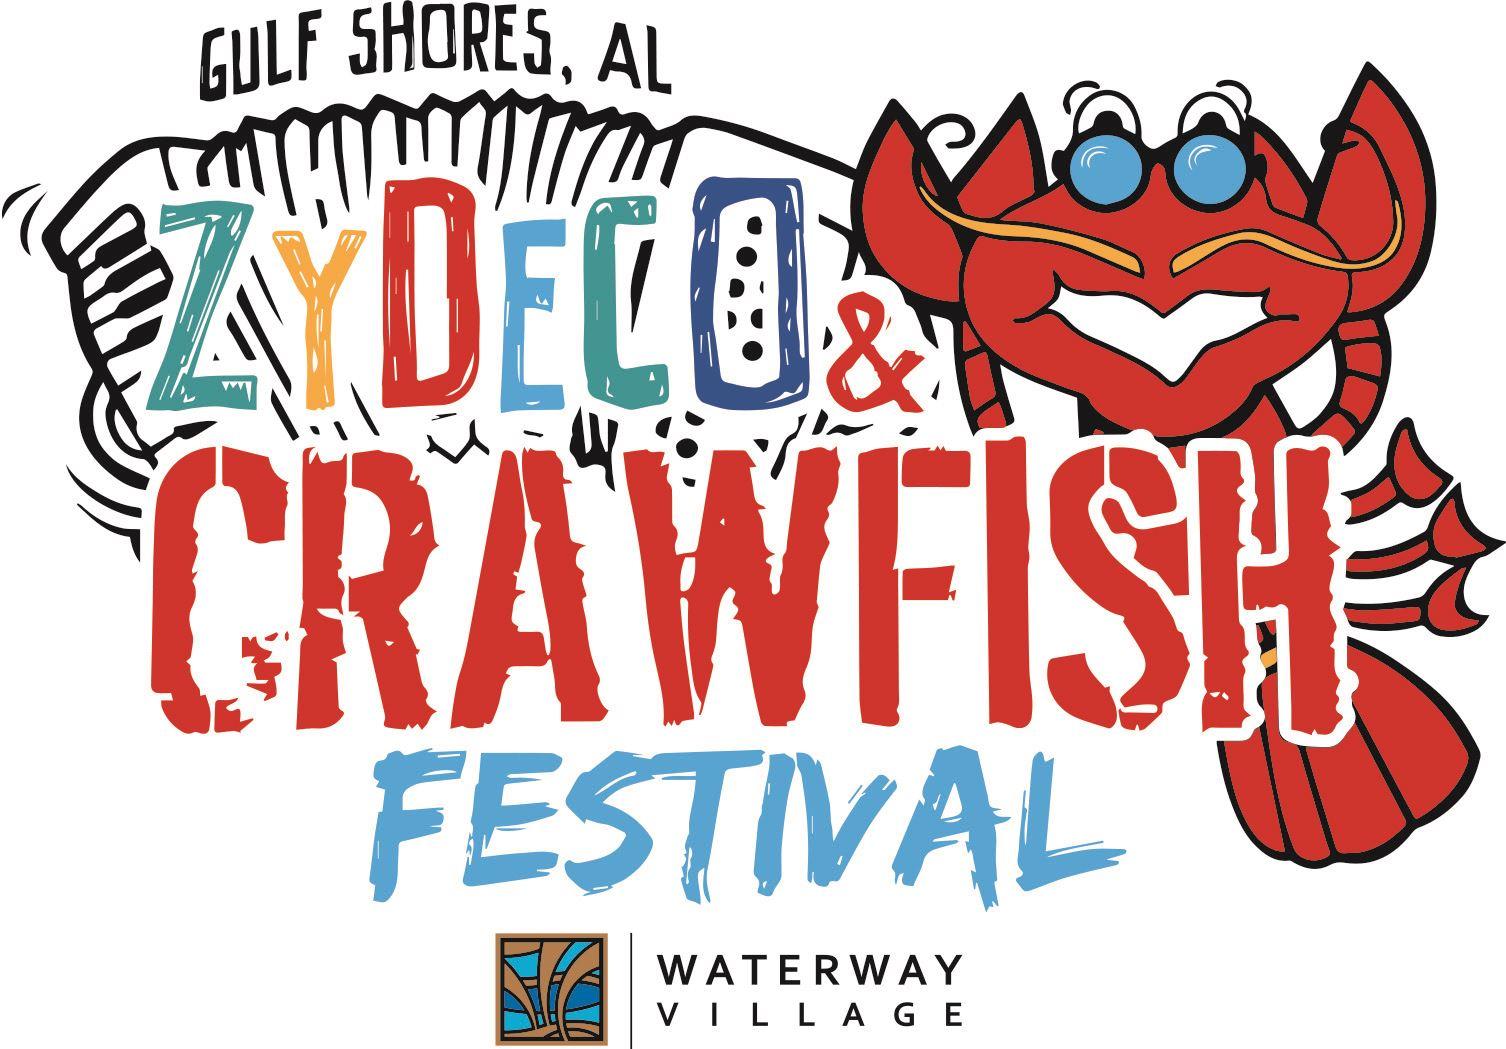 2019 Waterway Village Zydeco & Crawfish Festival & 5K Run